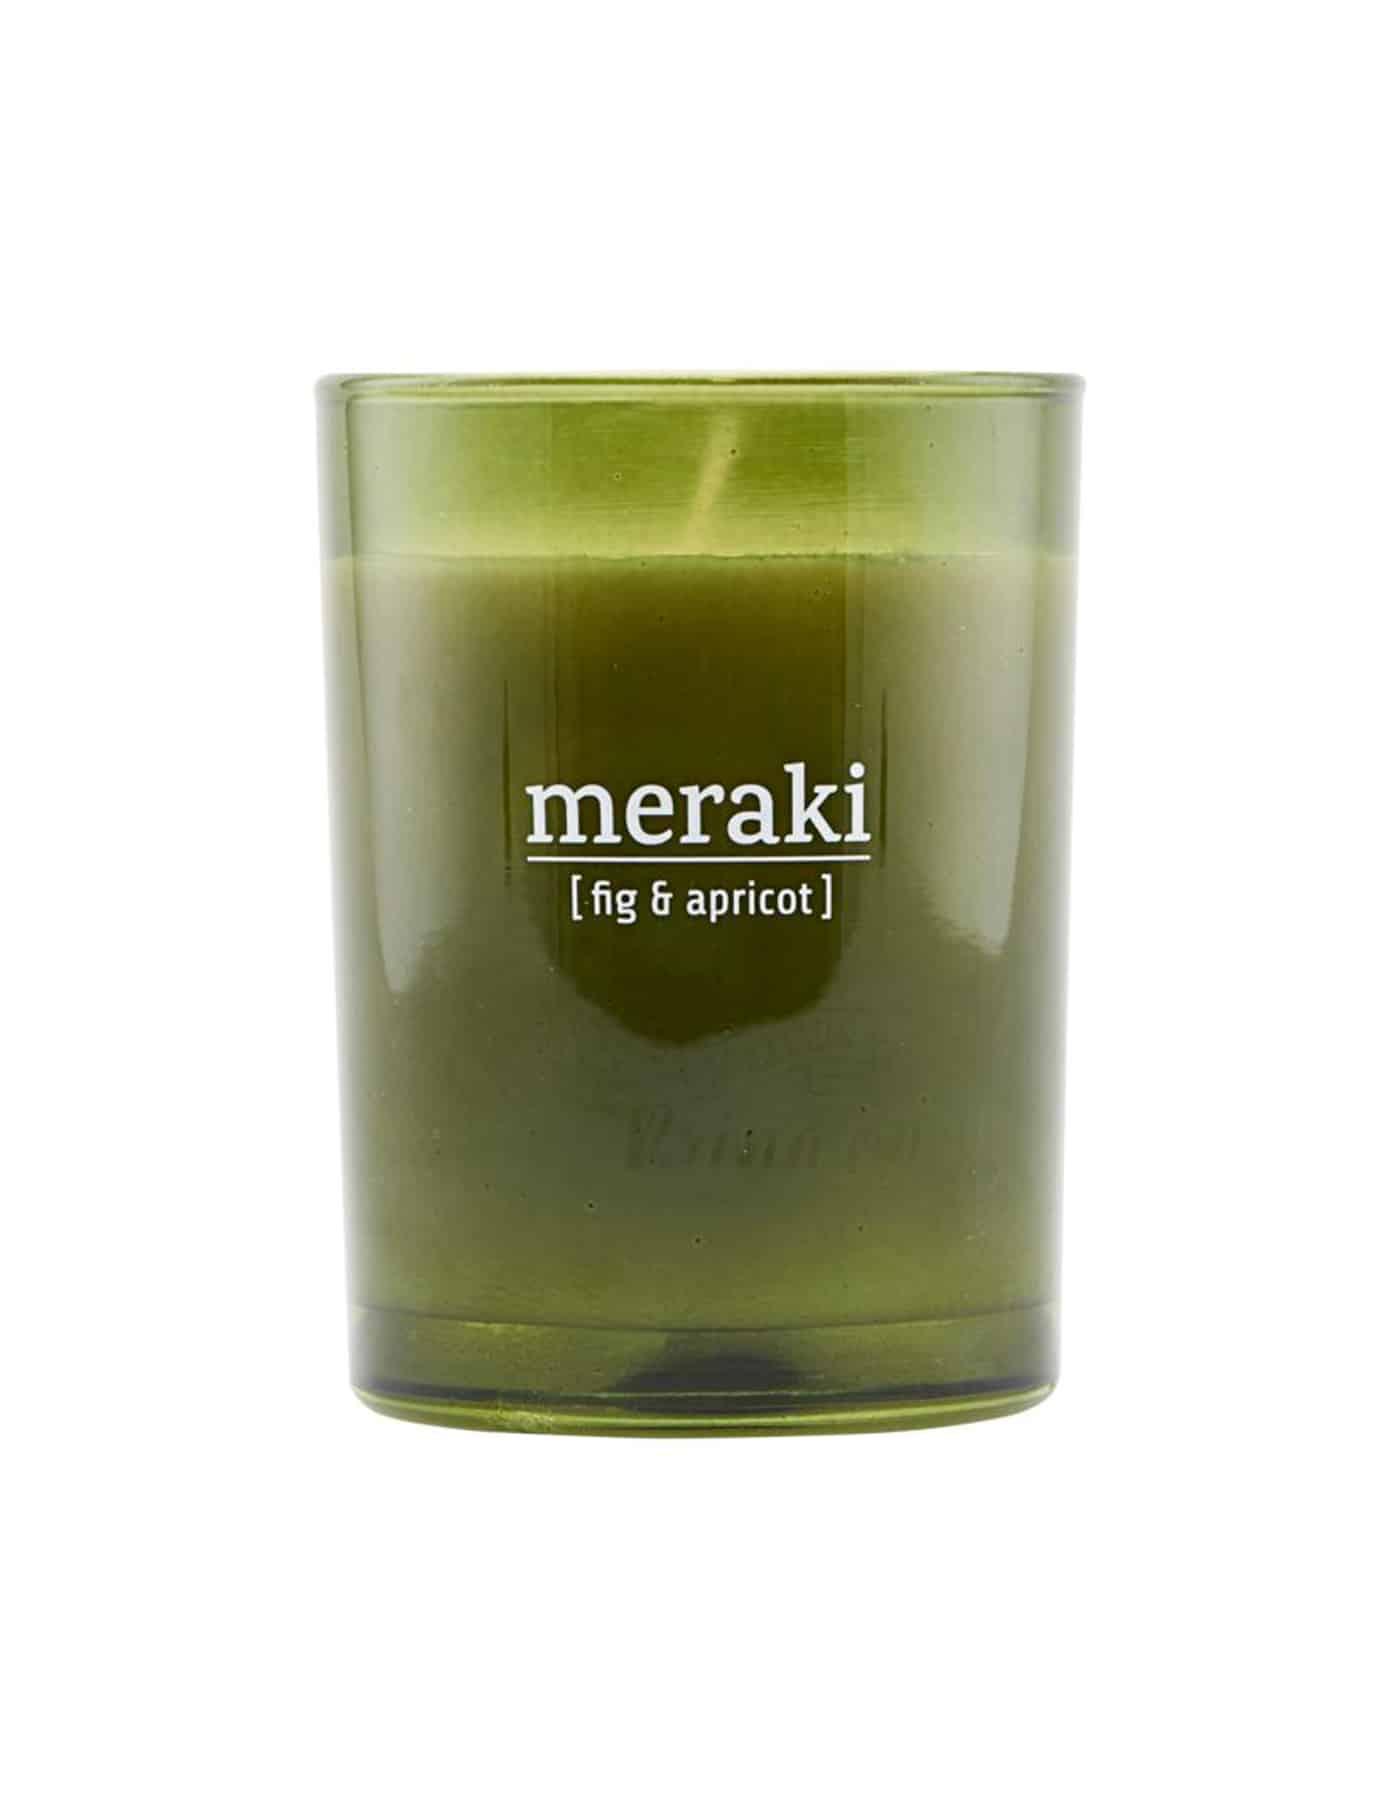 Meraki Scented Candle, Fig & Apricot